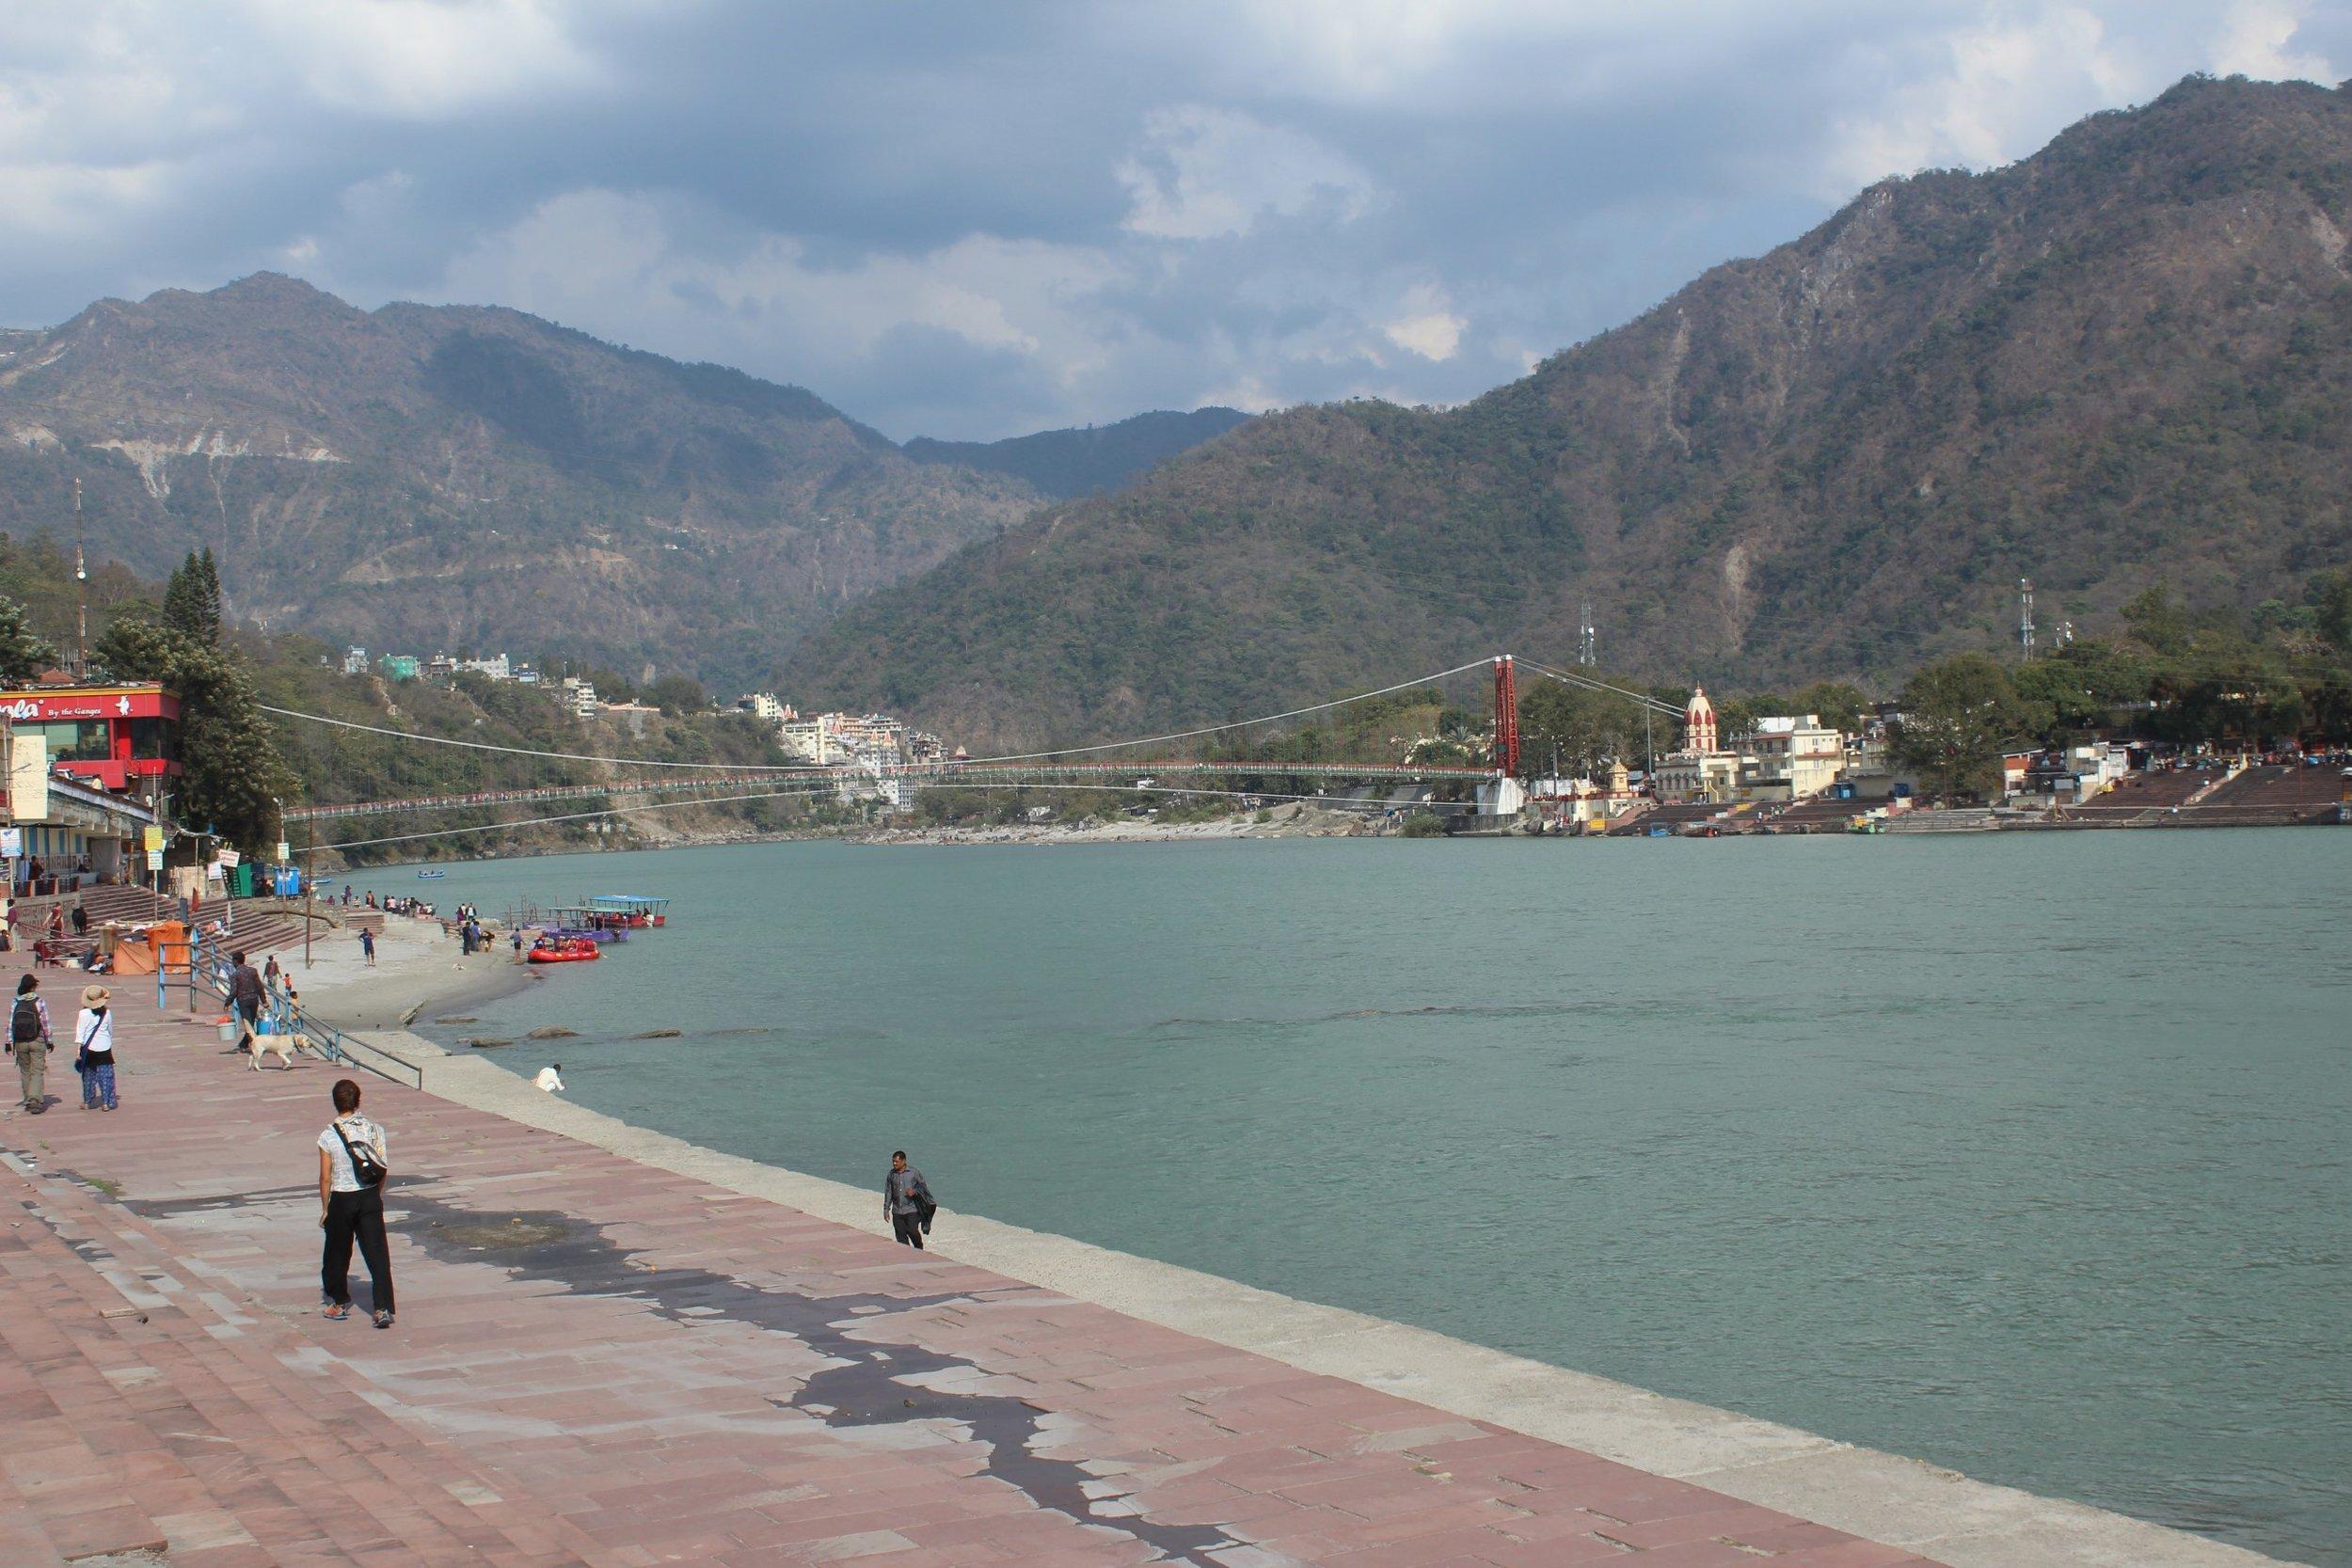 view of the Ram Jhula bridge over the Ganga